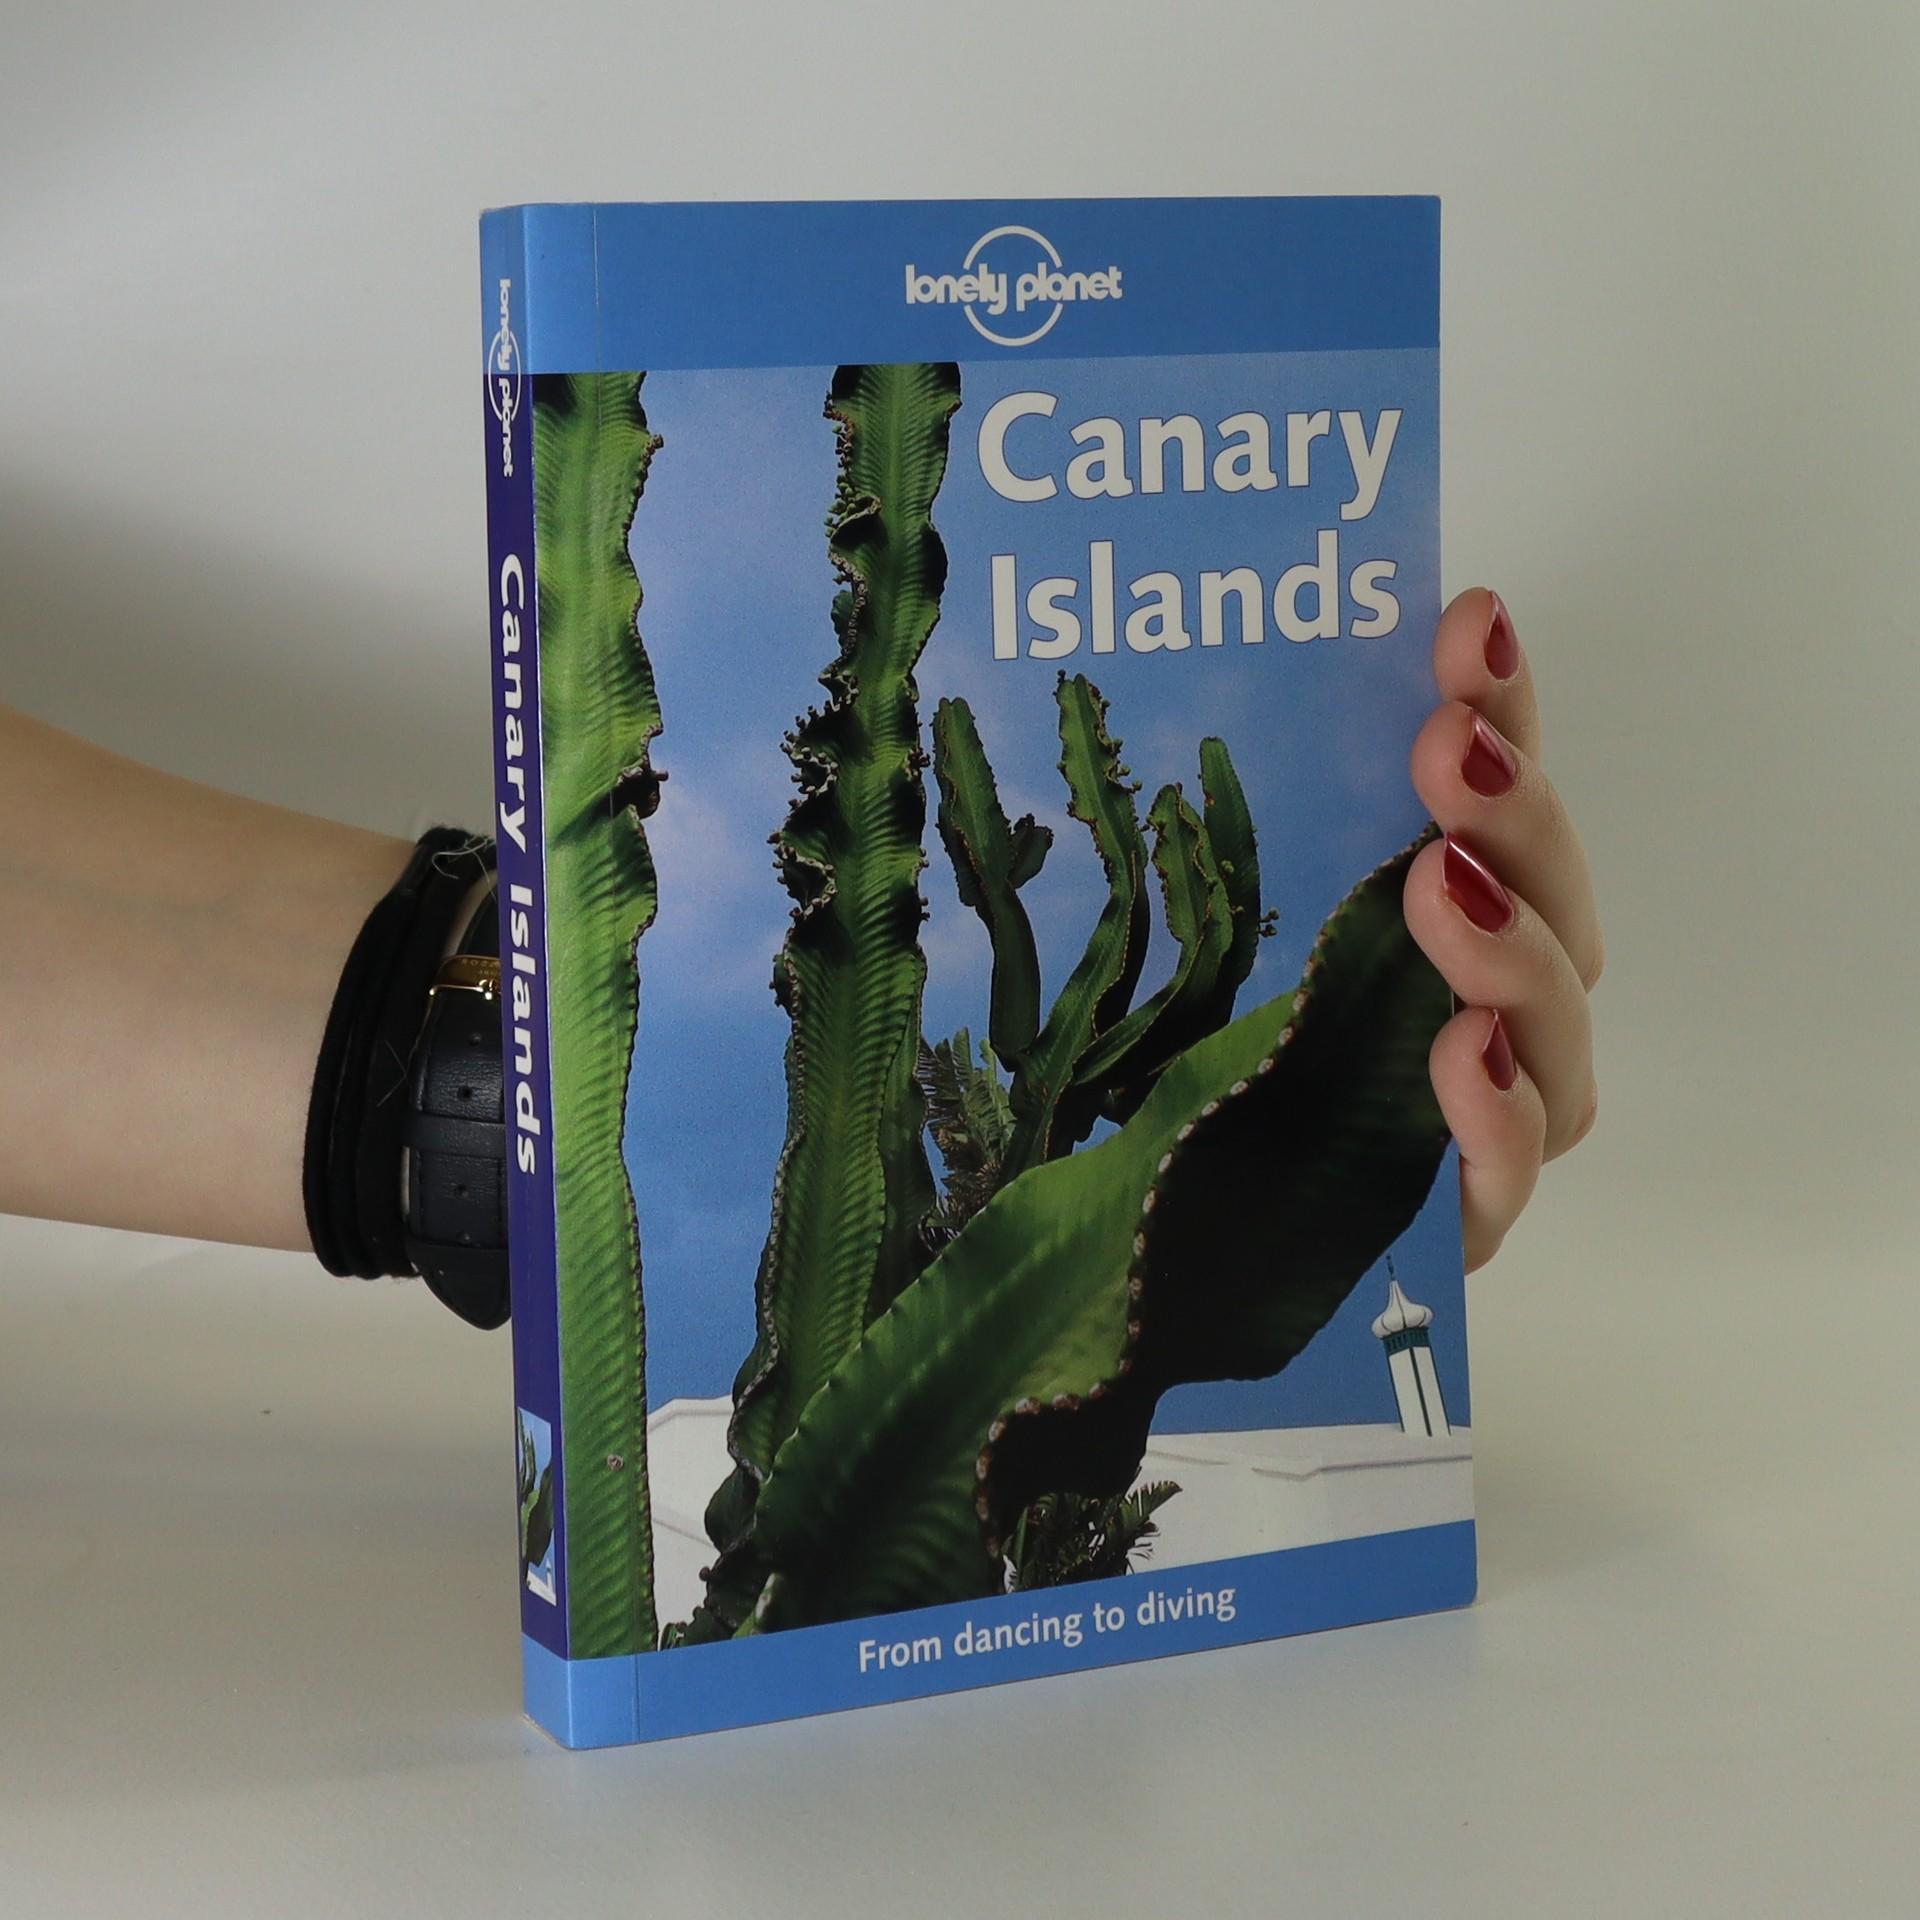 antikvární kniha Canary Islands, 2001